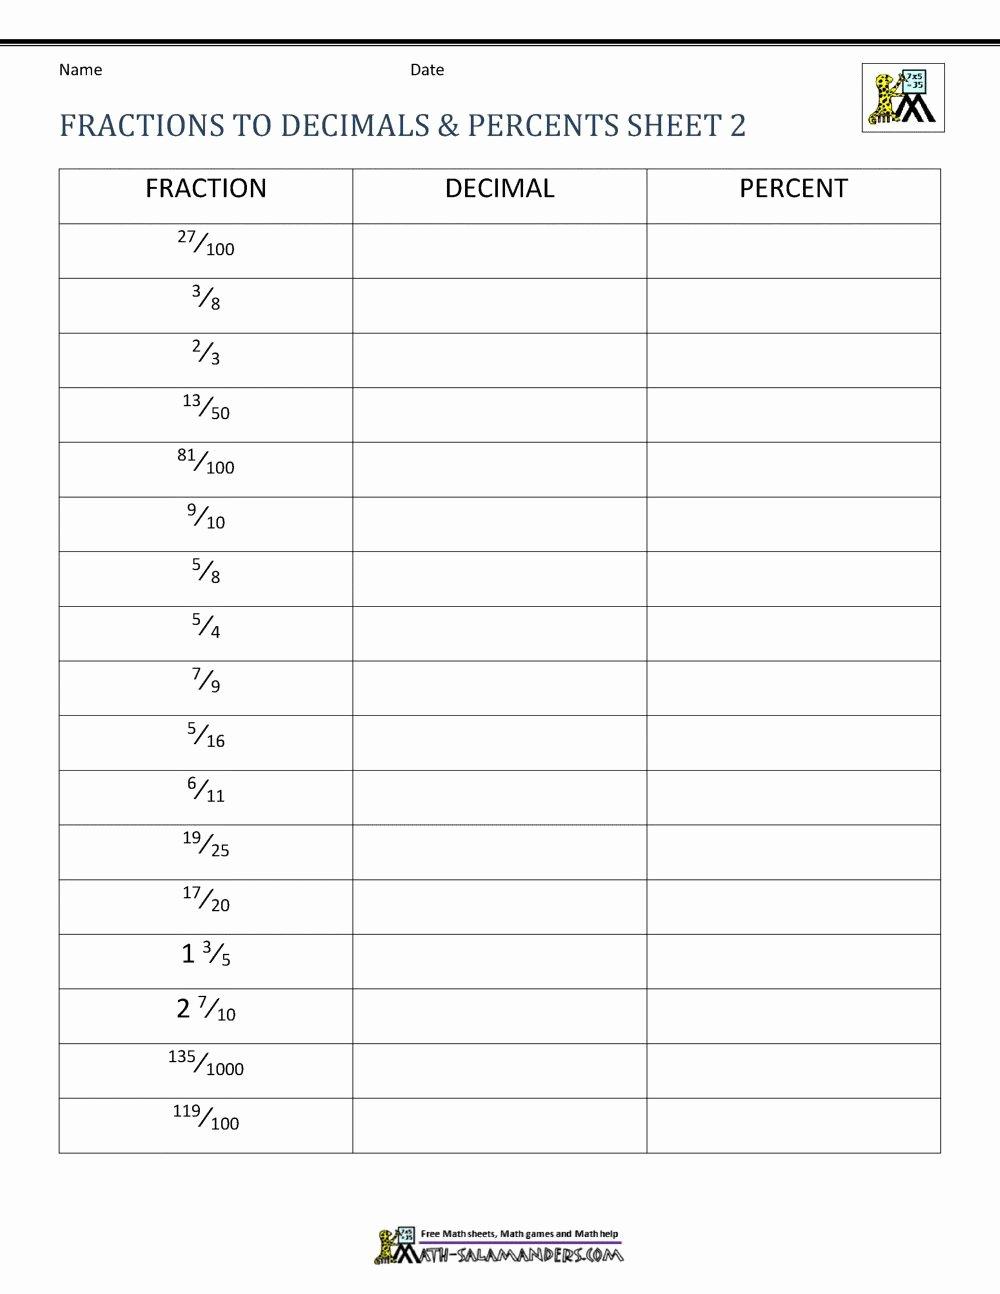 Fraction Decimal Percent Conversion Worksheet Free Wonderful Fraction Decimal Percent Chart In 2020